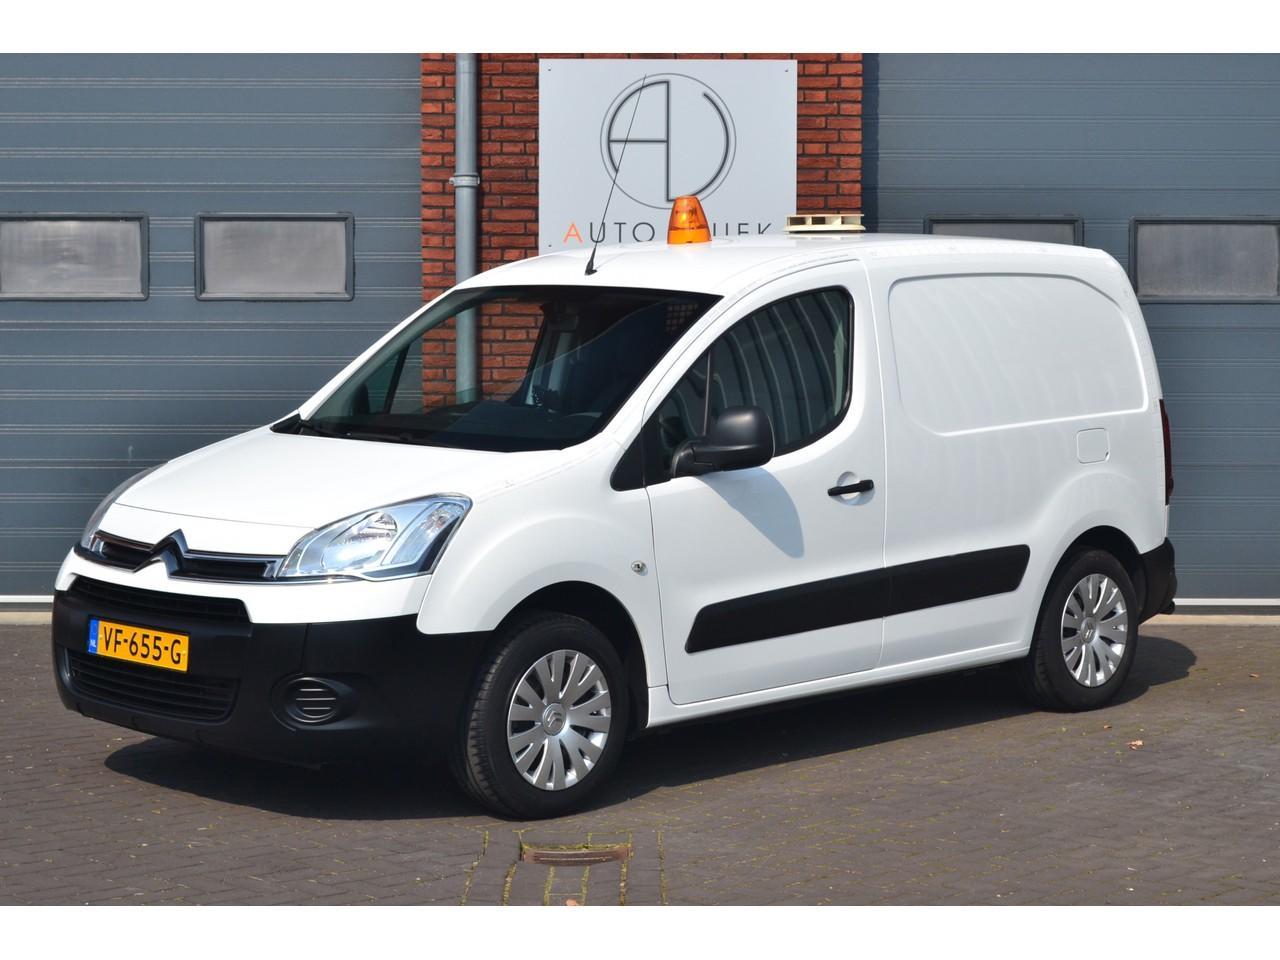 Citroën Berlingo 1.6 hdi 500 comfort economy airco, cruise control, schuifdeur met ruit, electro pakket